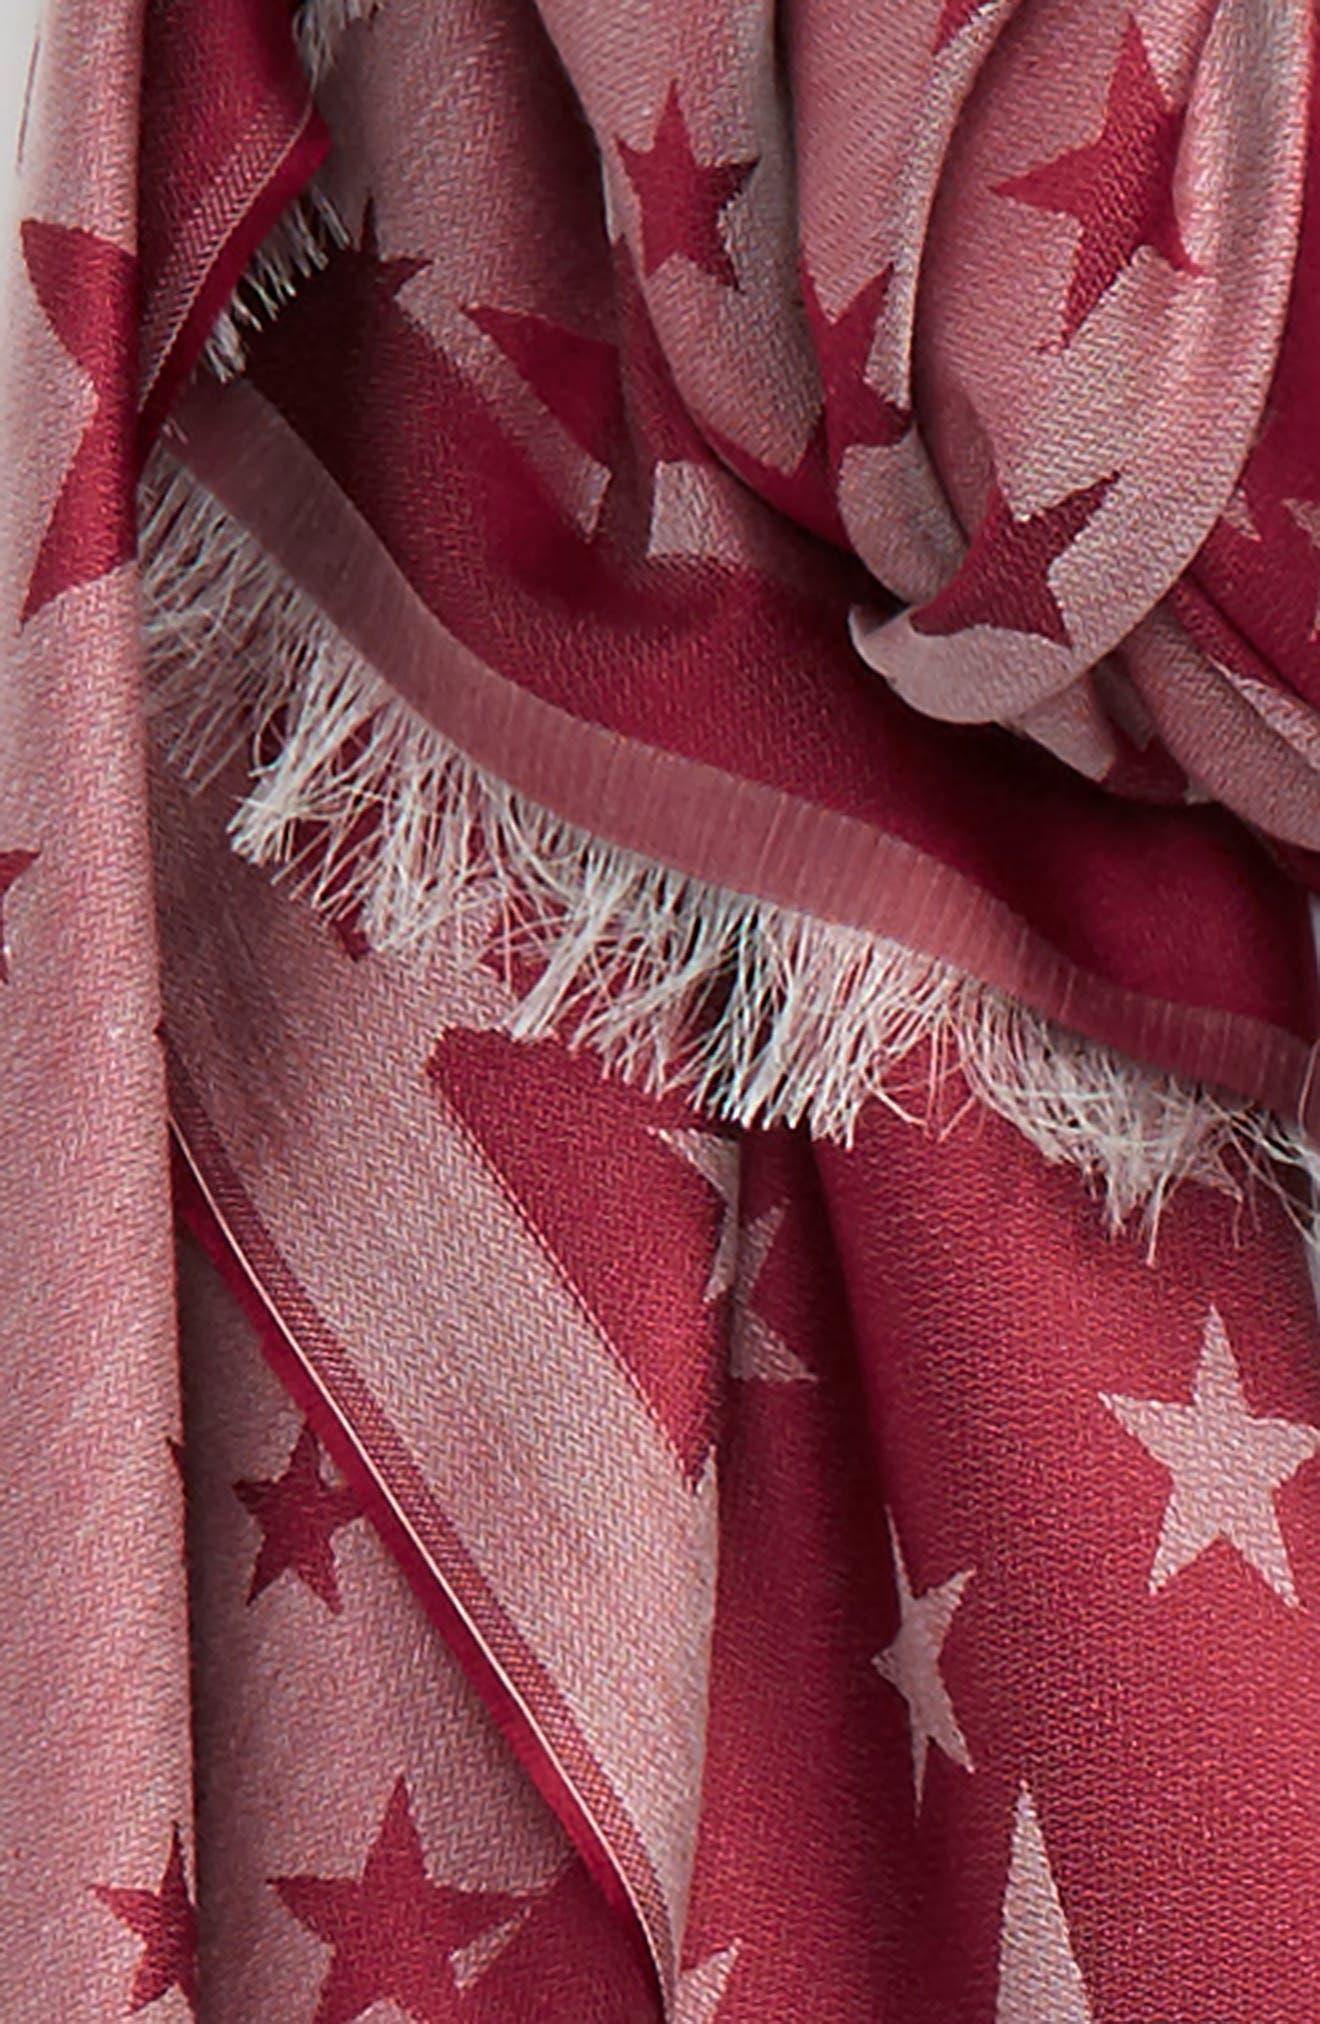 STELLA MCCARTNEY, Star Jacquard Silk & Modal Scarf, Alternate thumbnail 3, color, BURGUNDY